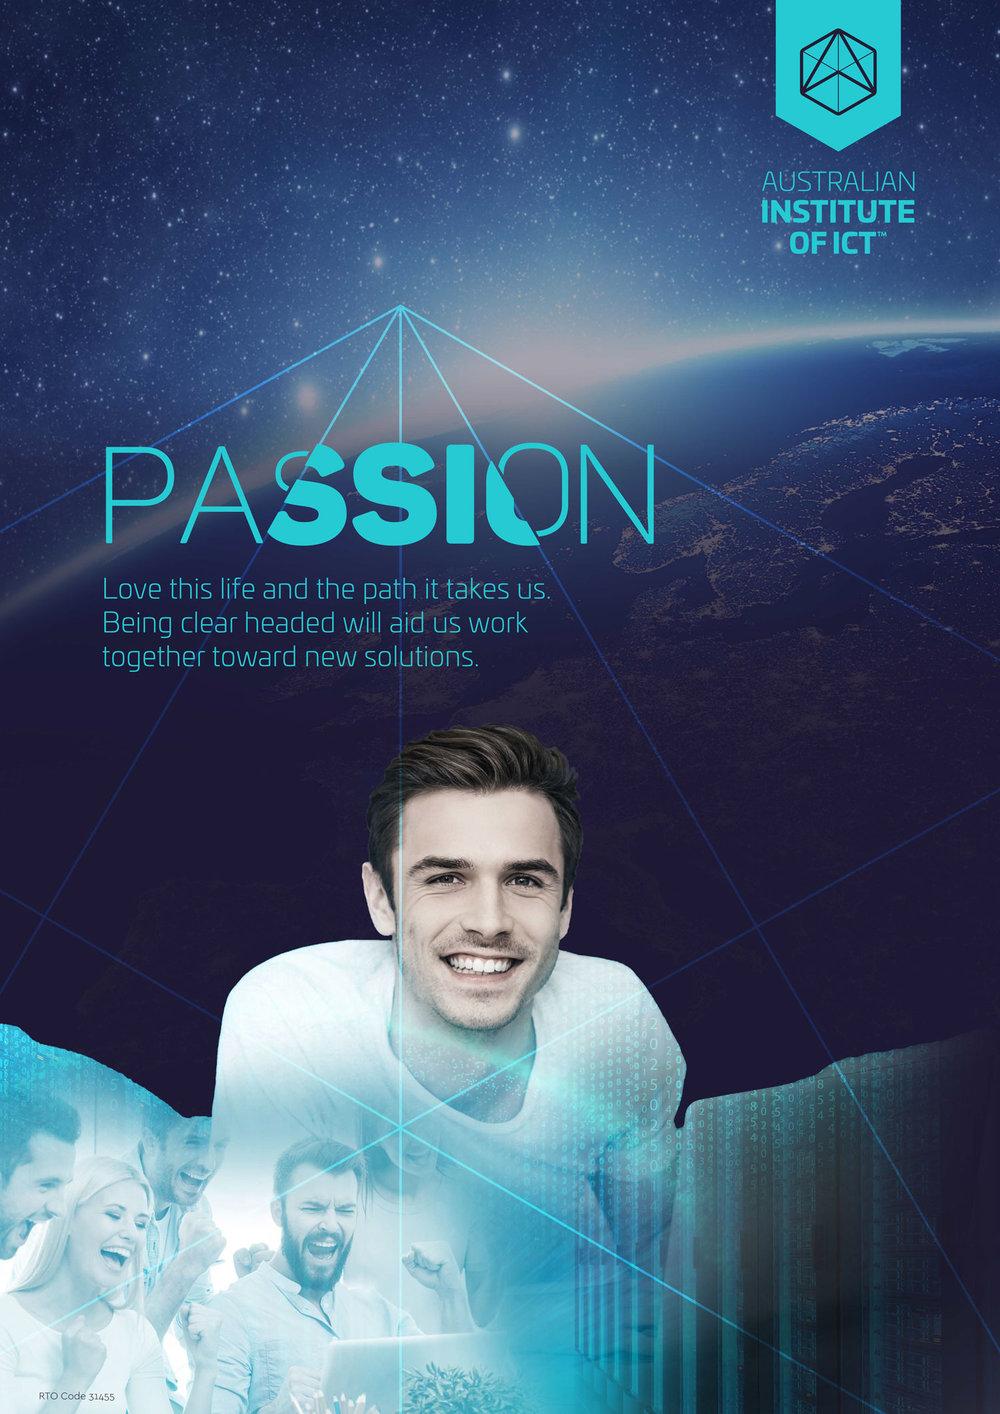 Passion Poster Design